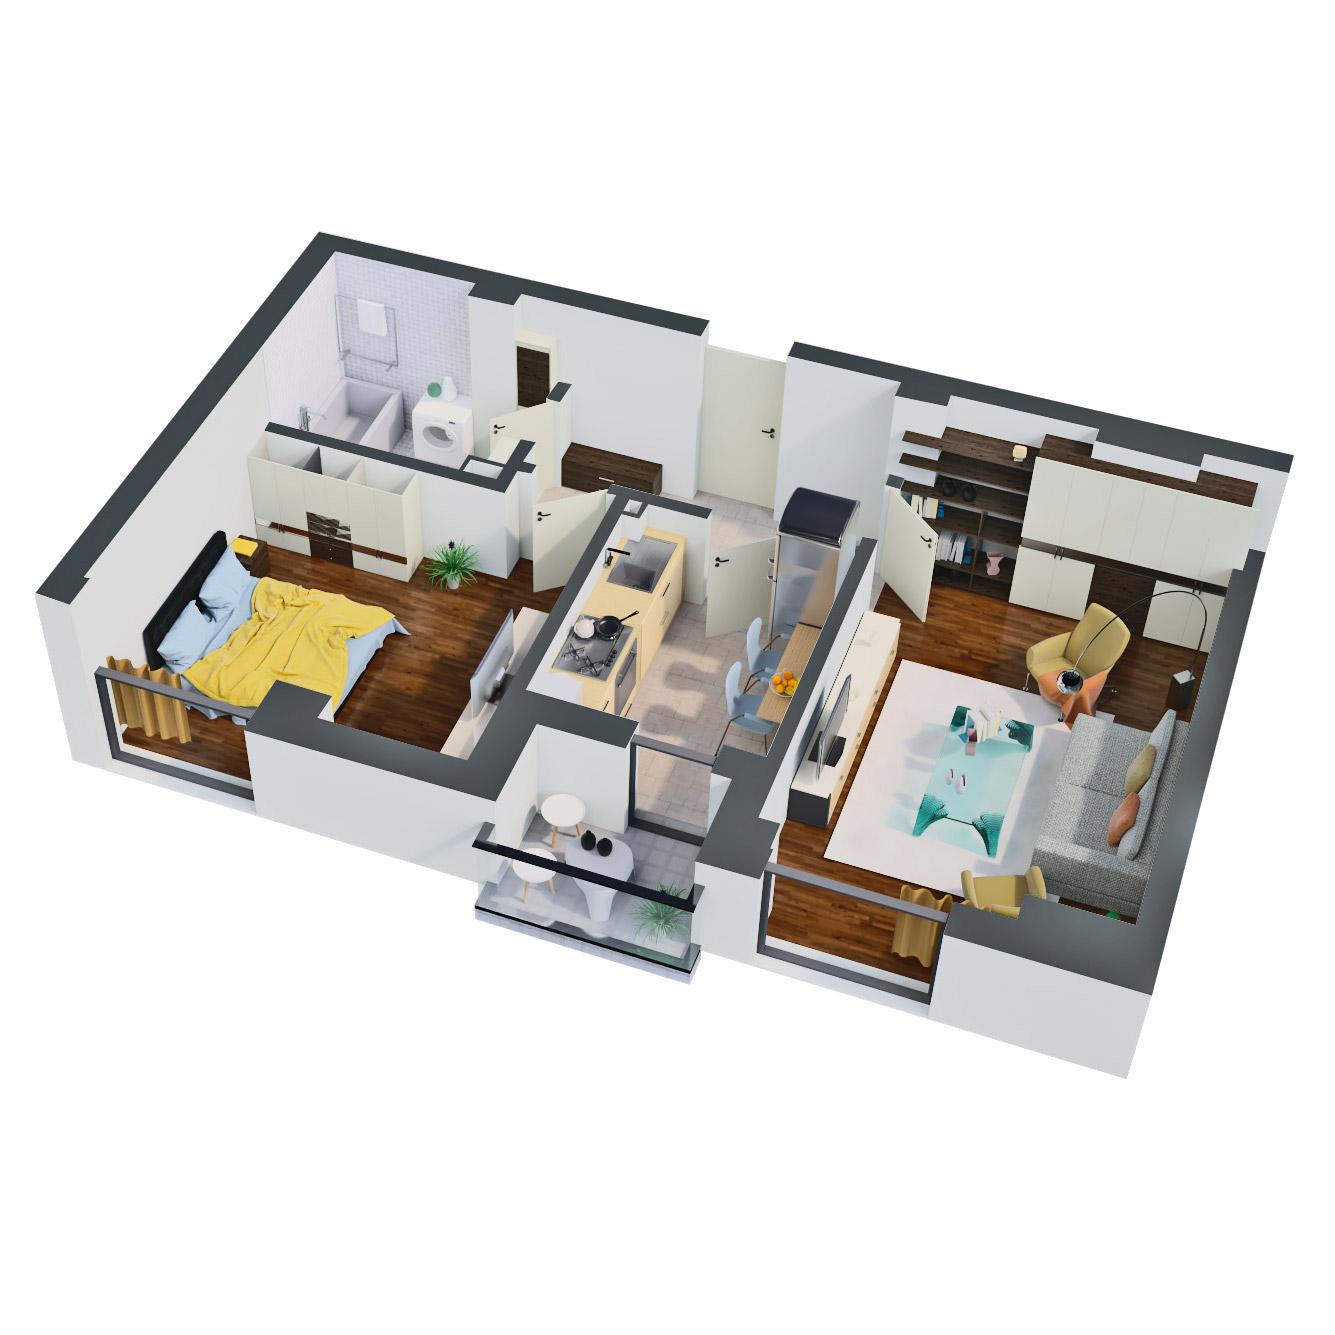 Apartament 2 camere de vanzare Bucuresti - Catedral Residence - Marriott, Piata Unirii, 13 Septembrie, Izvor - Tip 1 - T2 - B